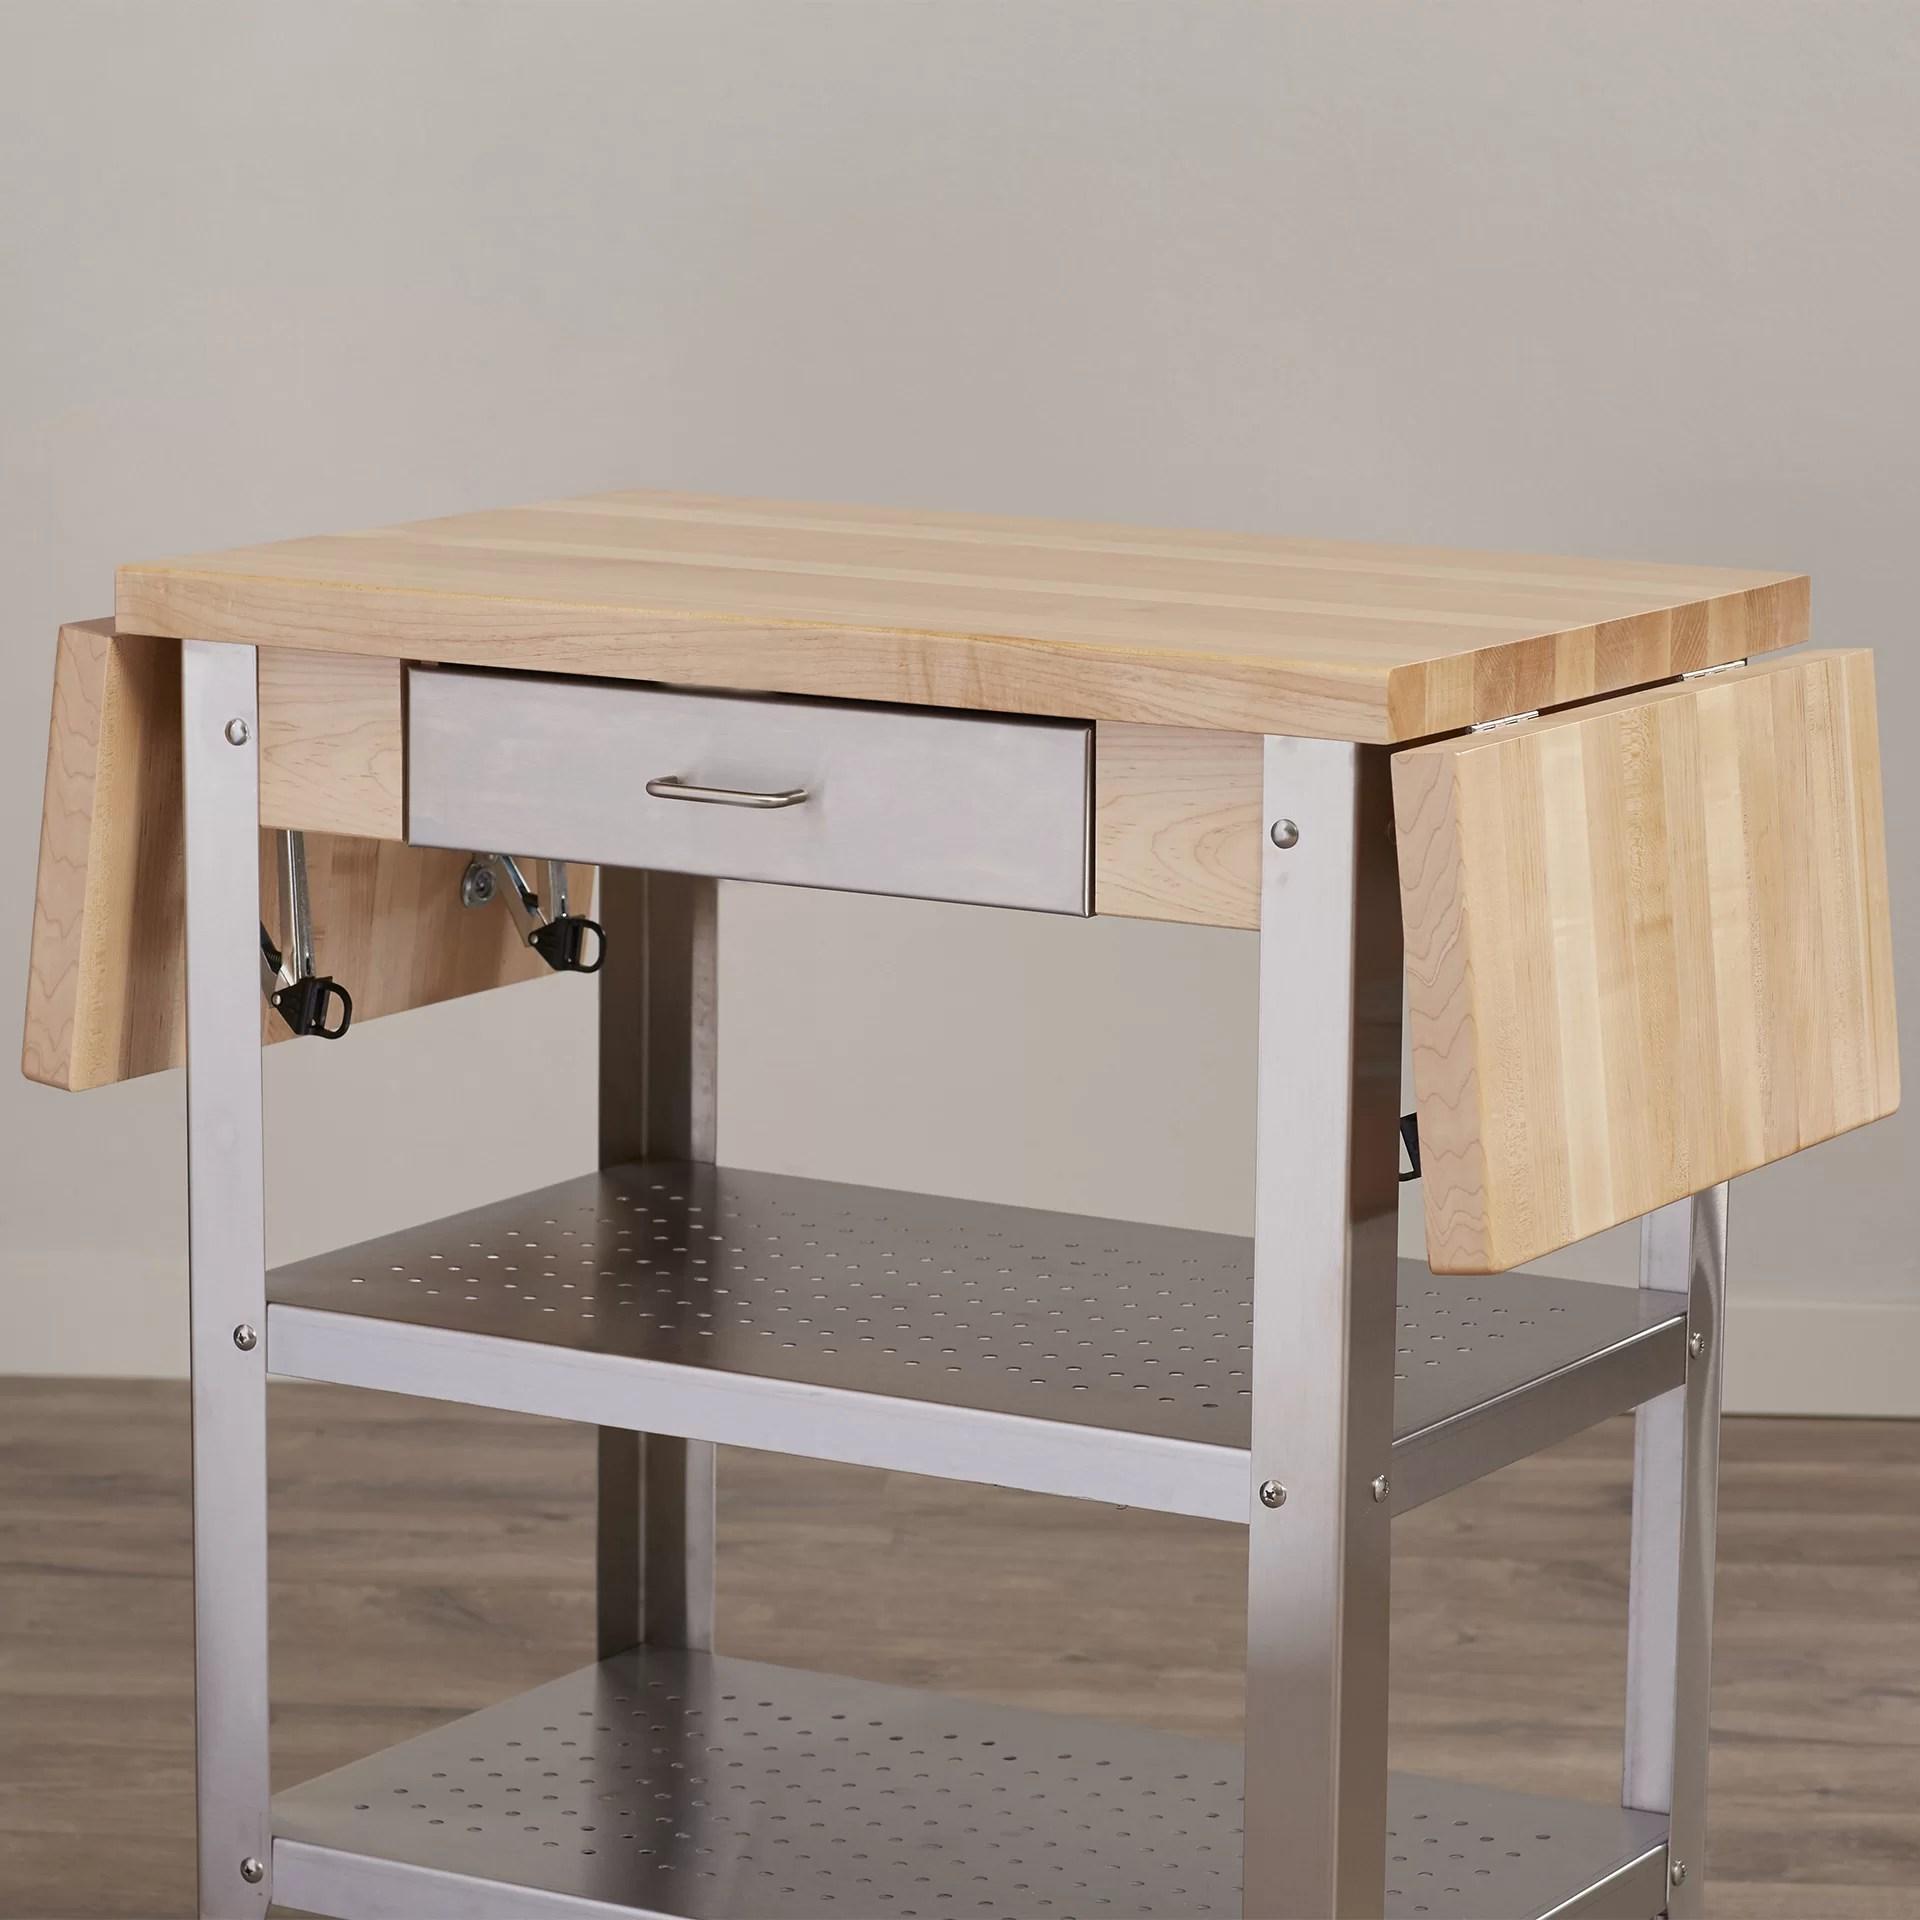 john boos kitchen islands shaker style cabinet hardware cucina americana cart with wood top